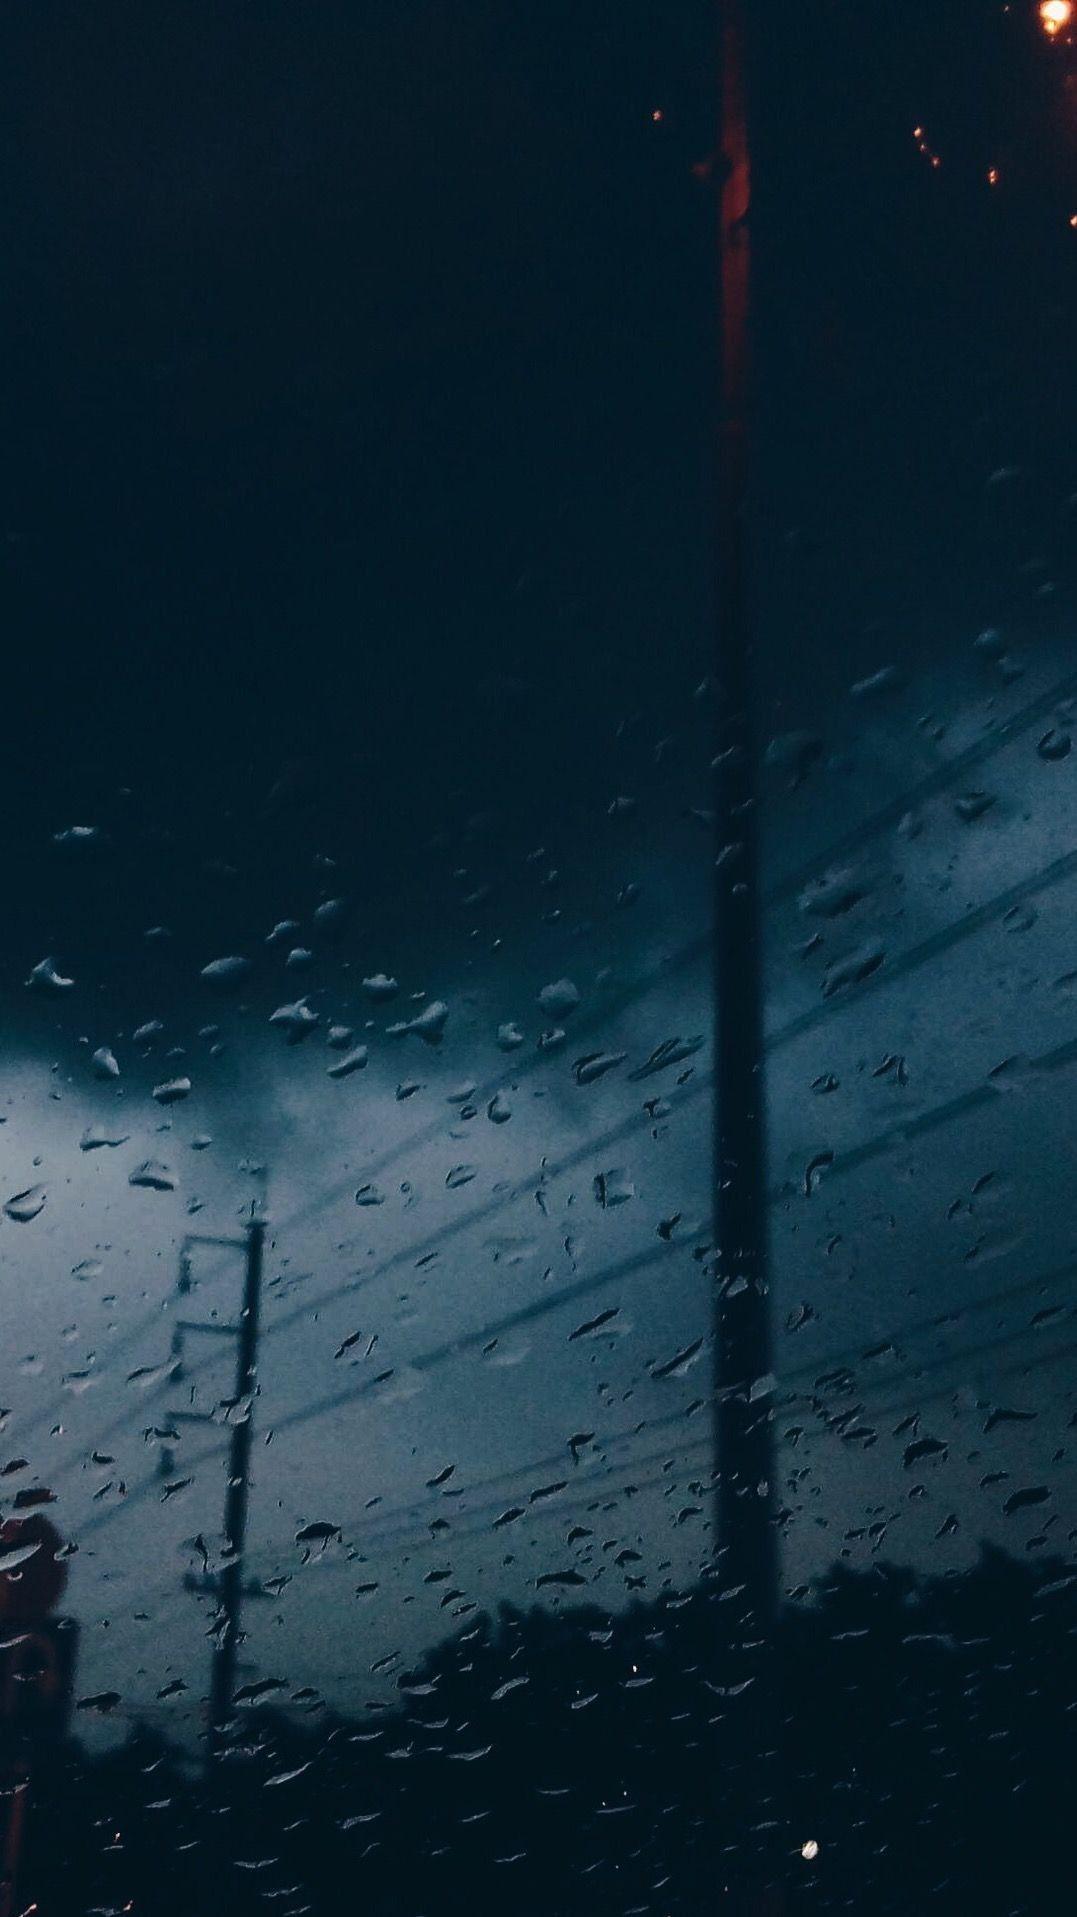 Rain love Rain wallpapers Sky aesthetic Aesthetic wallpapers 1077x1917